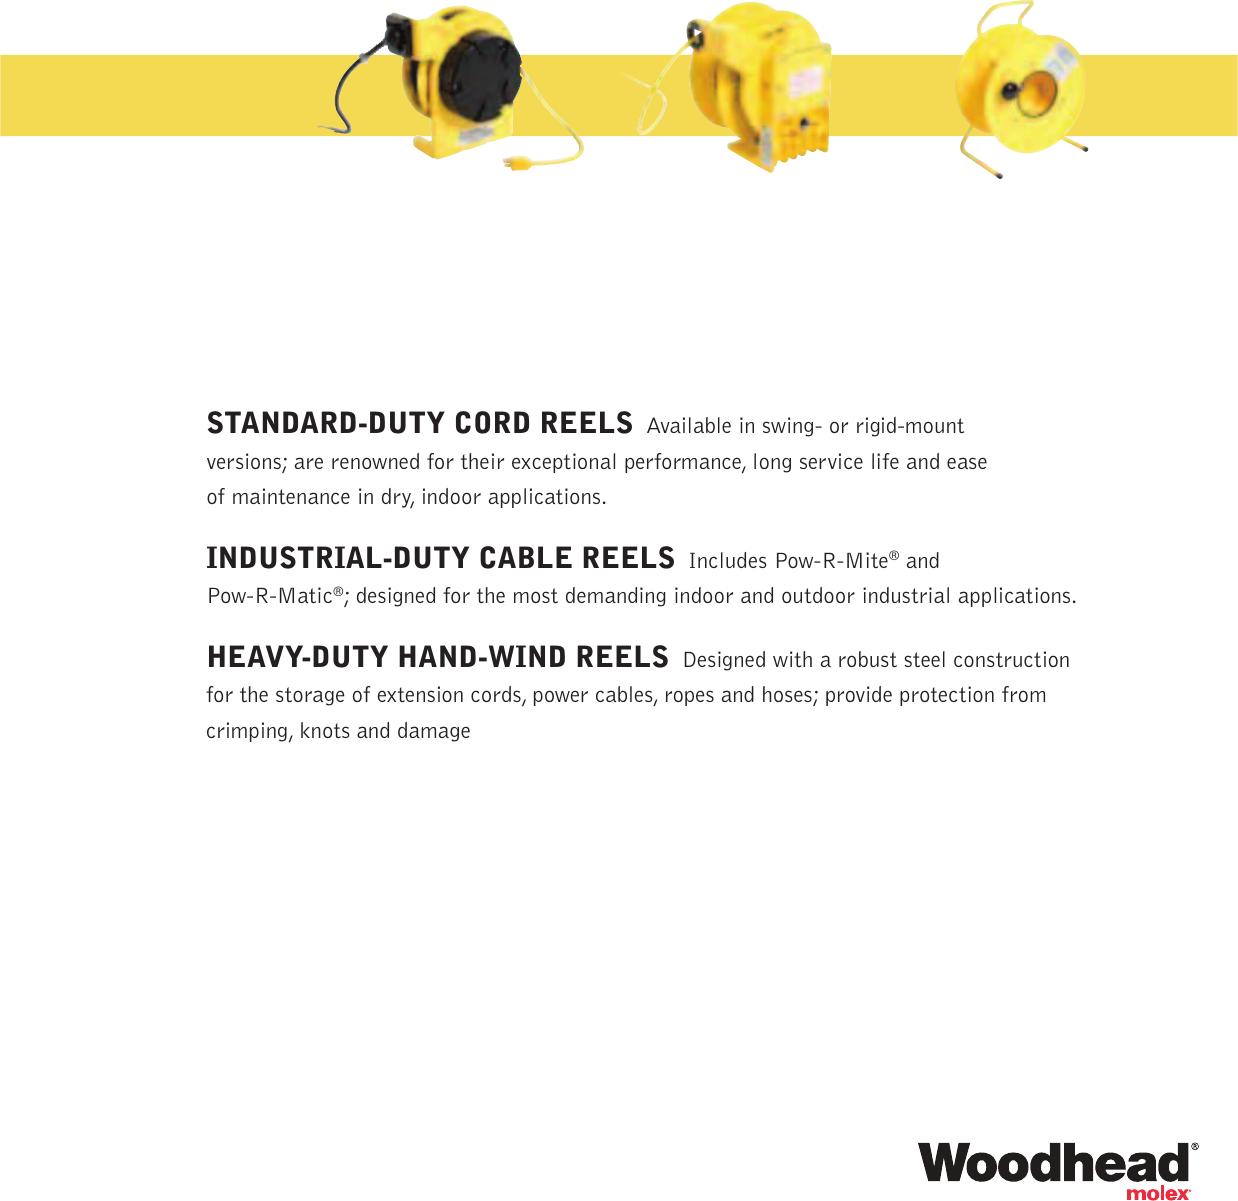 Woodhead 5542NM Cable Strain Relief Grip .625-.750 Cable Diameter 3//4 NPT Thread Size .625-.750 Cable Diameter Molex Straight Male Non-Metallic Mesh Orange Grommet Color Max-Loc Cord Seal 3//4 NPT Thread Size Locknut